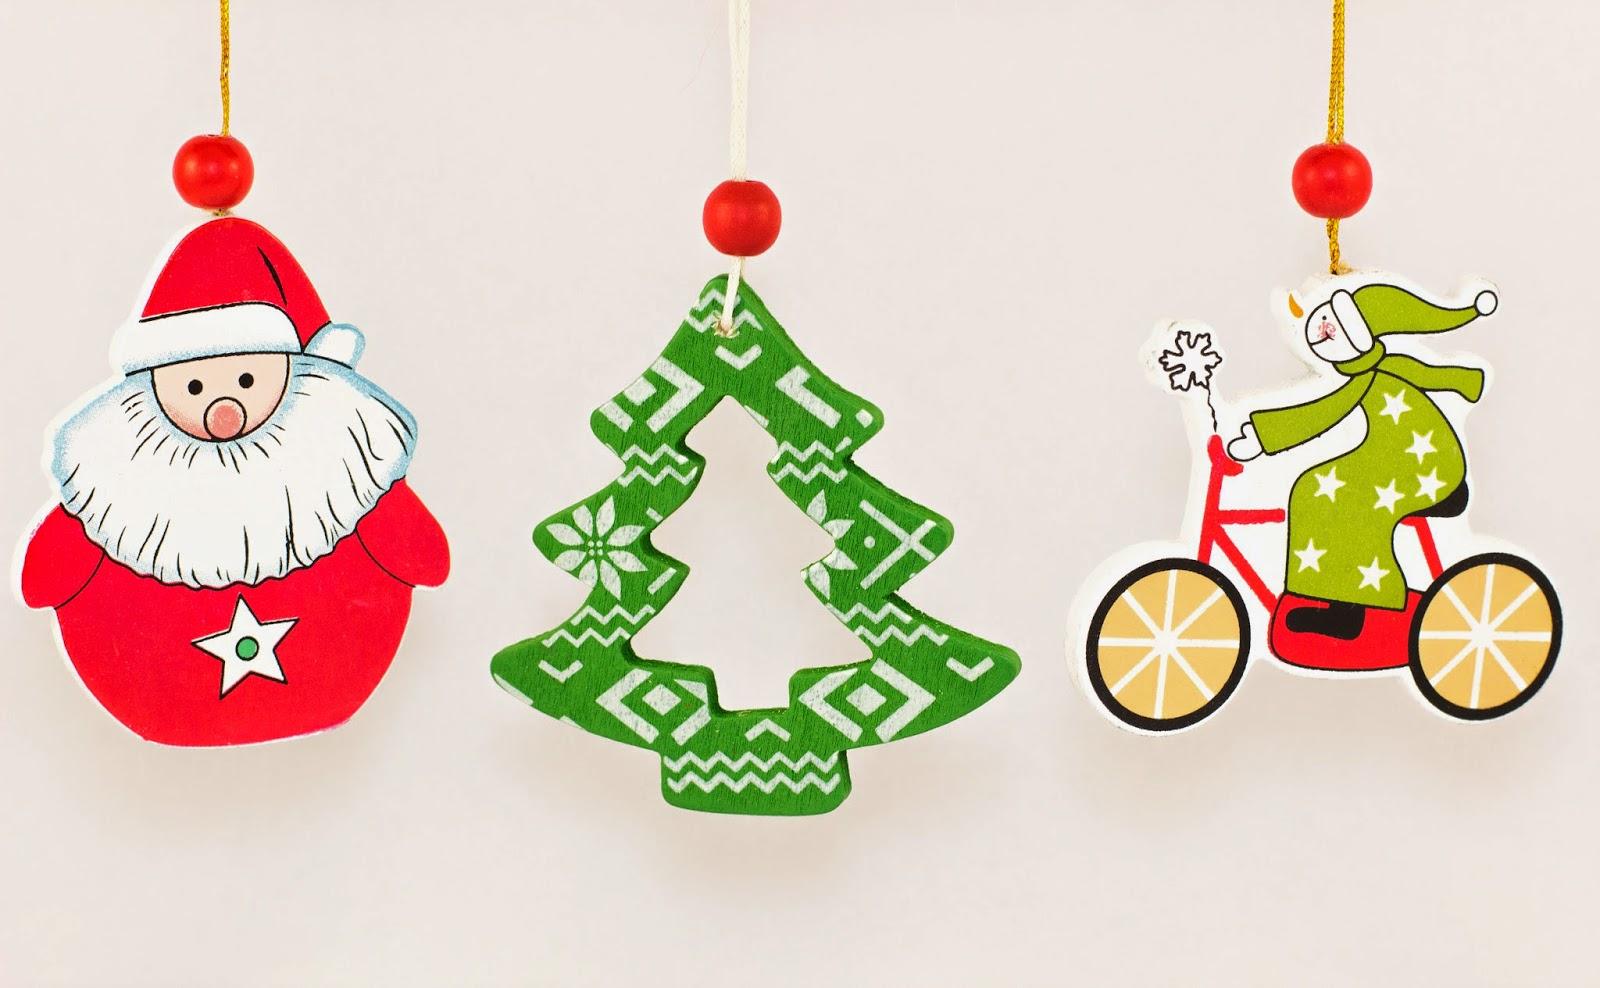 Santa-xmas-tree-Christmas-cartoon-images-for-kids-children-5184x3202.jpg